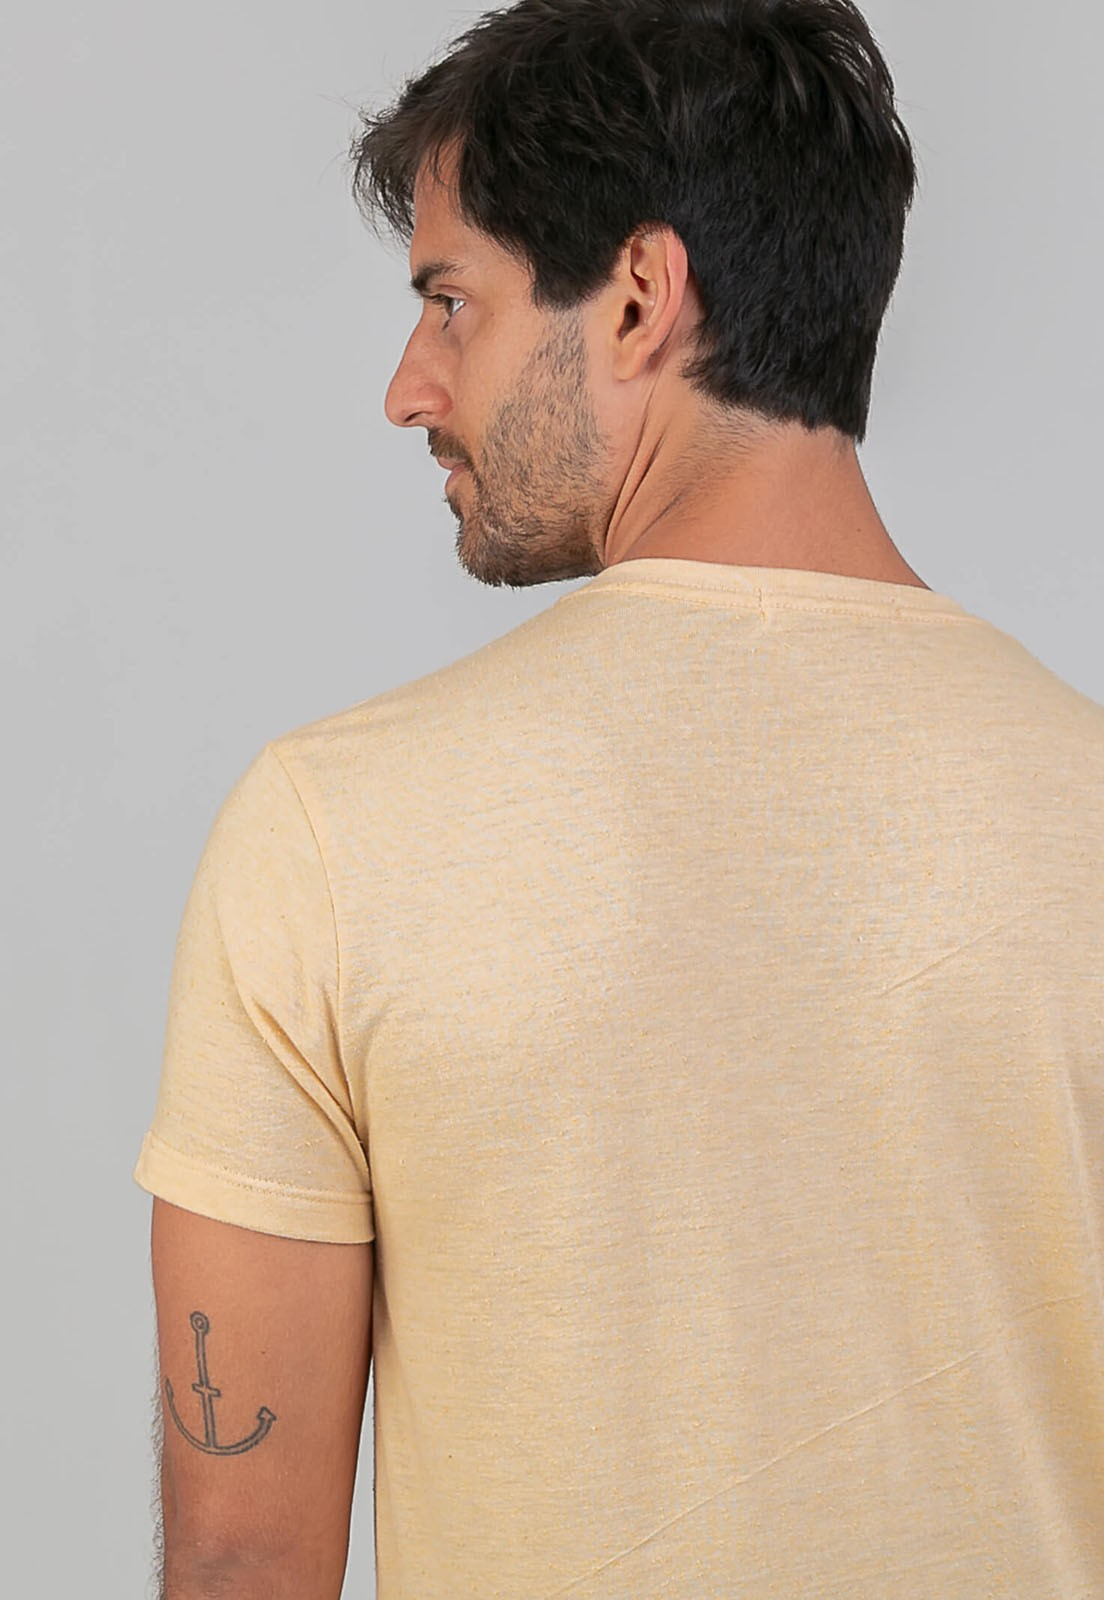 T-shirt Terra Great melty